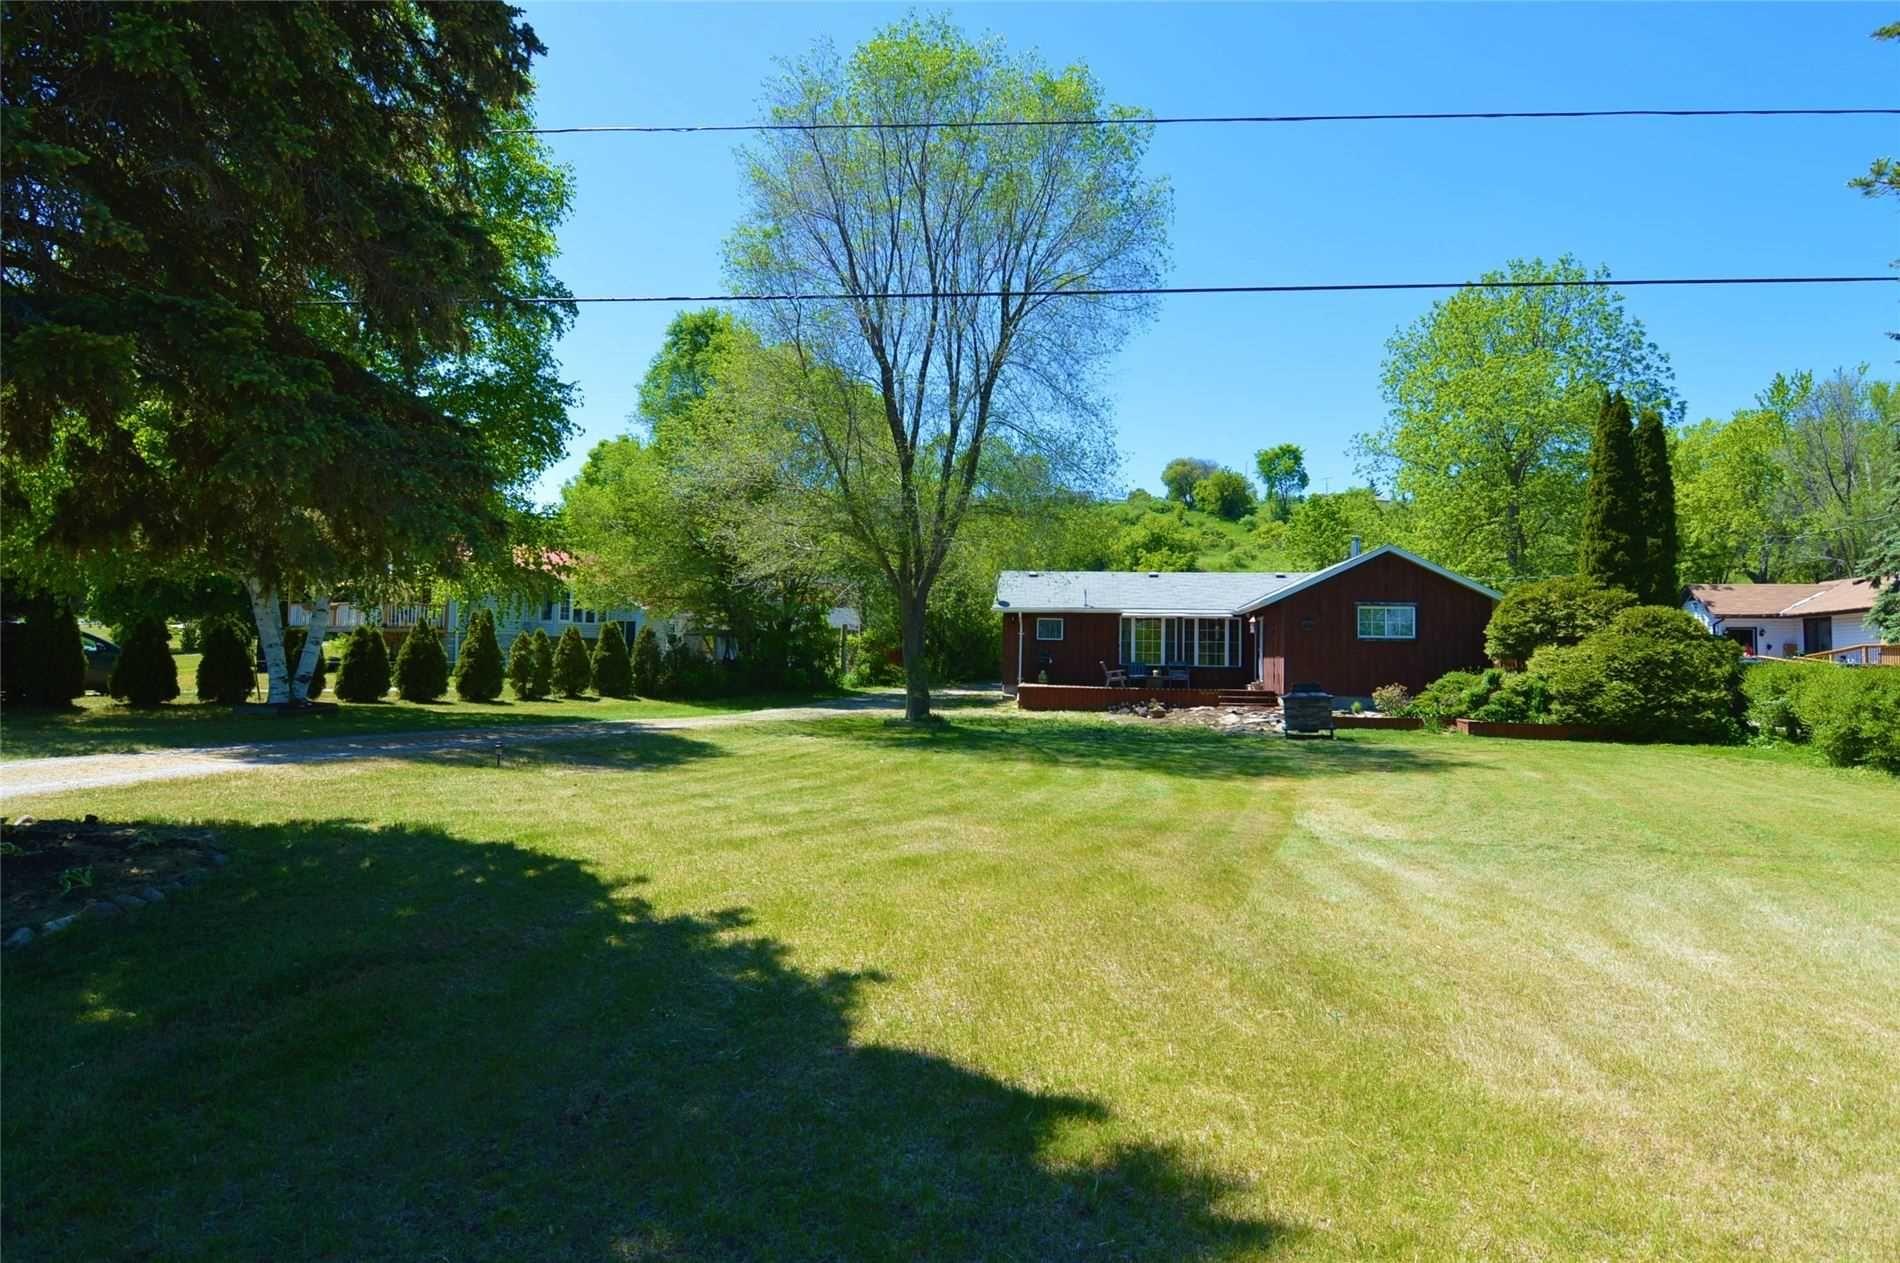 Main Photo: 122 Indian Road in Asphodel-Norwood: Rural Asphodel-Norwood House (Bungalow) for sale : MLS®# X5254279